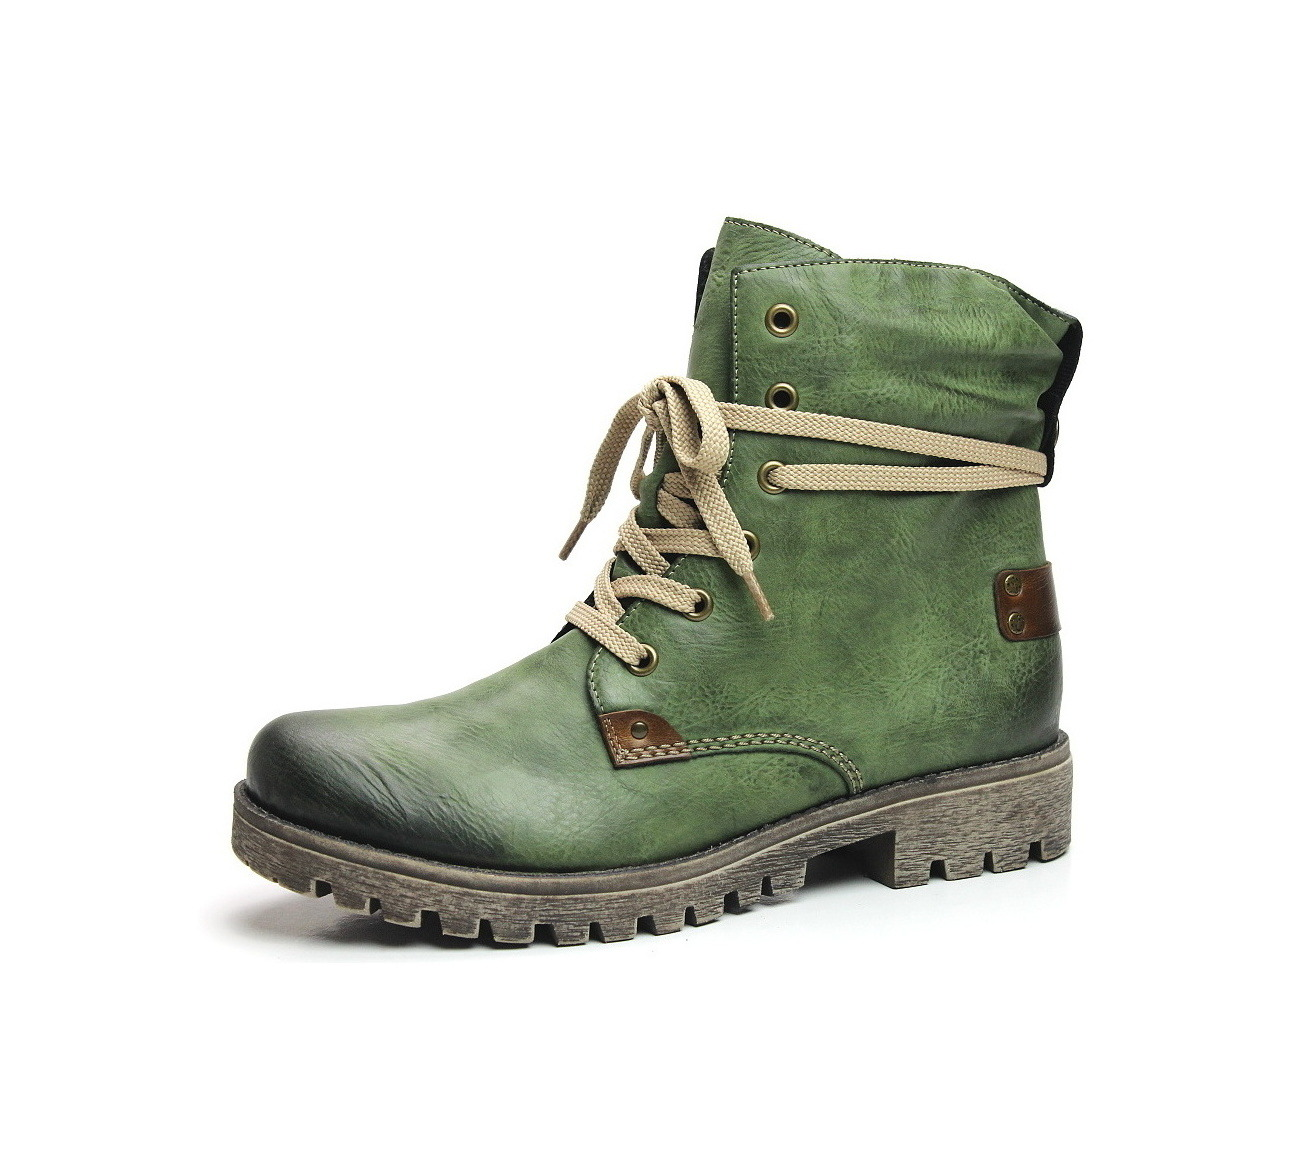 Soňa - Dámska obuv - Kotníčky - Dámska obuv značky Rieker zelenej farby 1ef2cce7cd